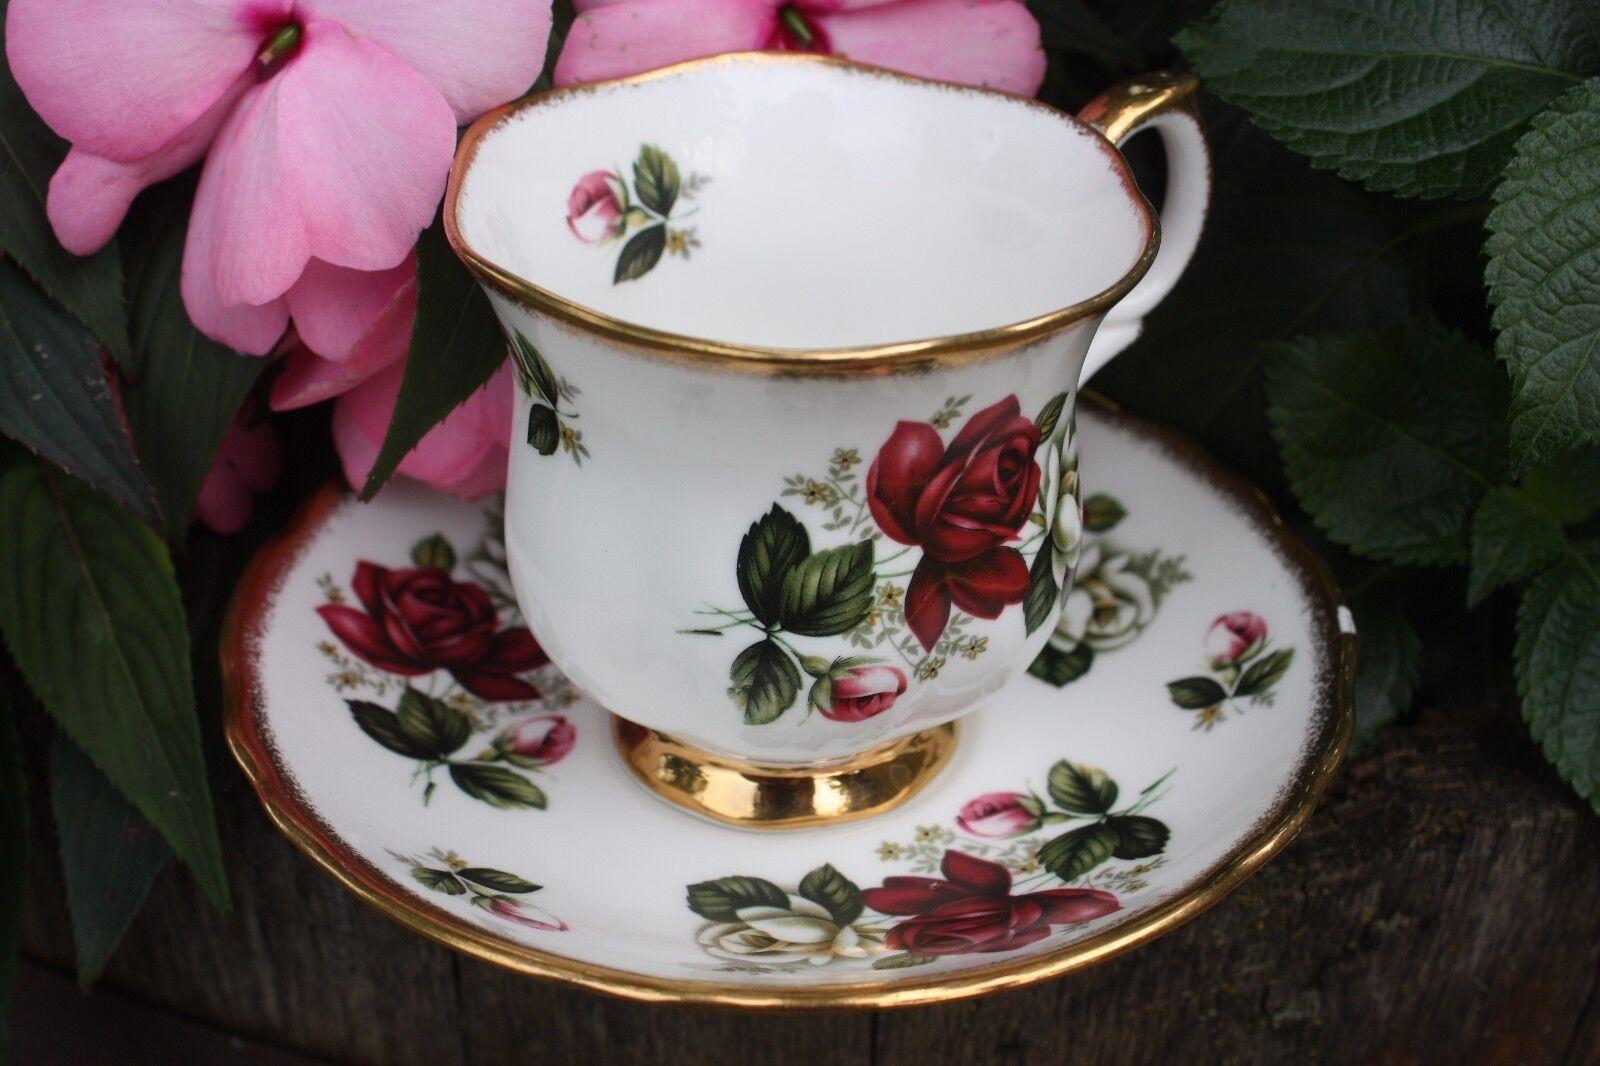 vintage crown staffordshire england fine bone china tea cup set g922 picclick. Black Bedroom Furniture Sets. Home Design Ideas